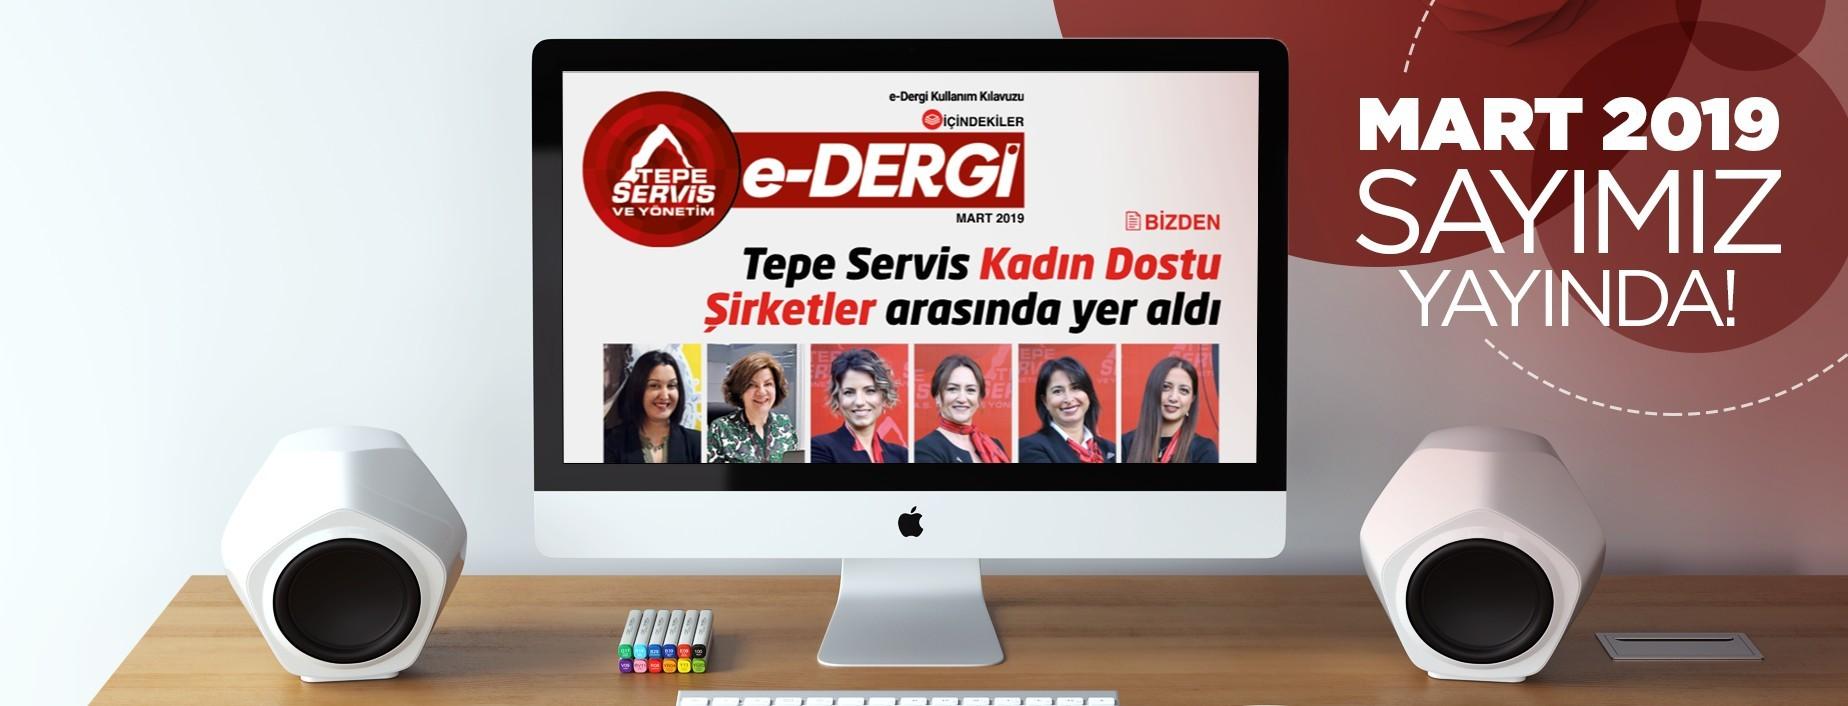 E-Dergi Mart 2019